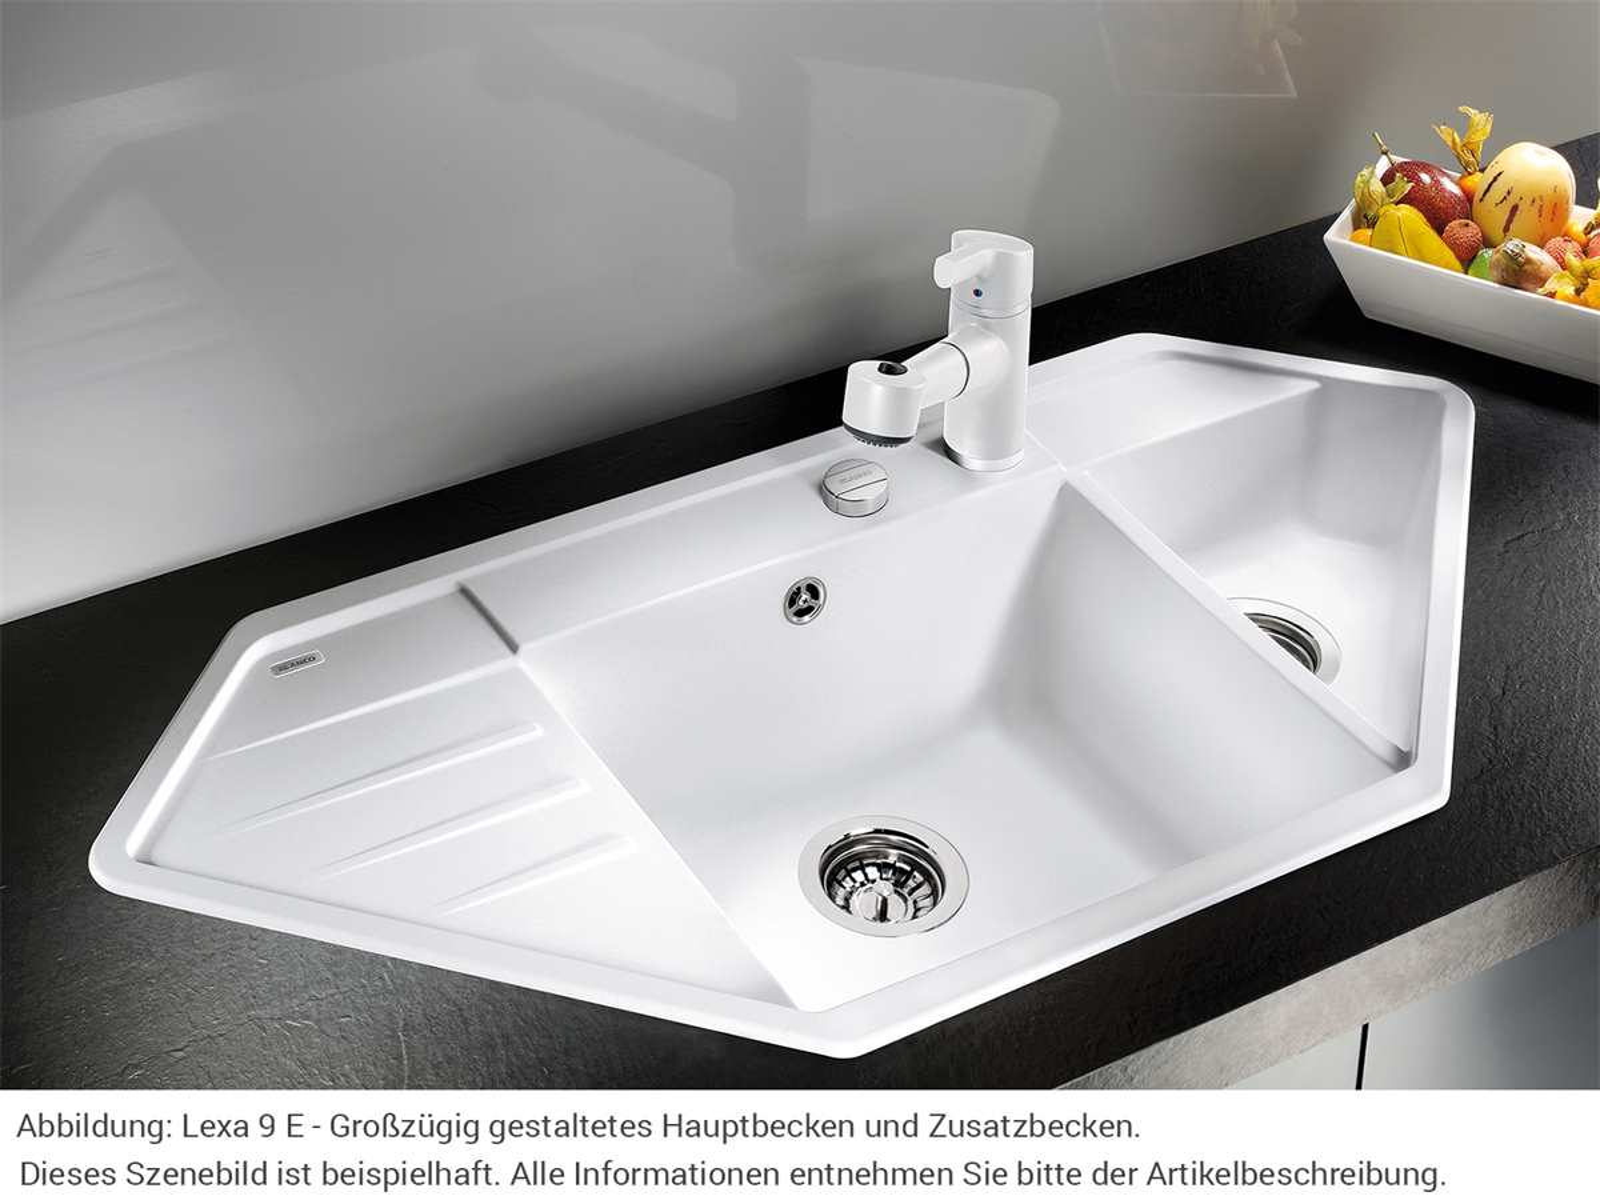 Blanco Lexa 9 E Muskat - 521 879 Granitspüle